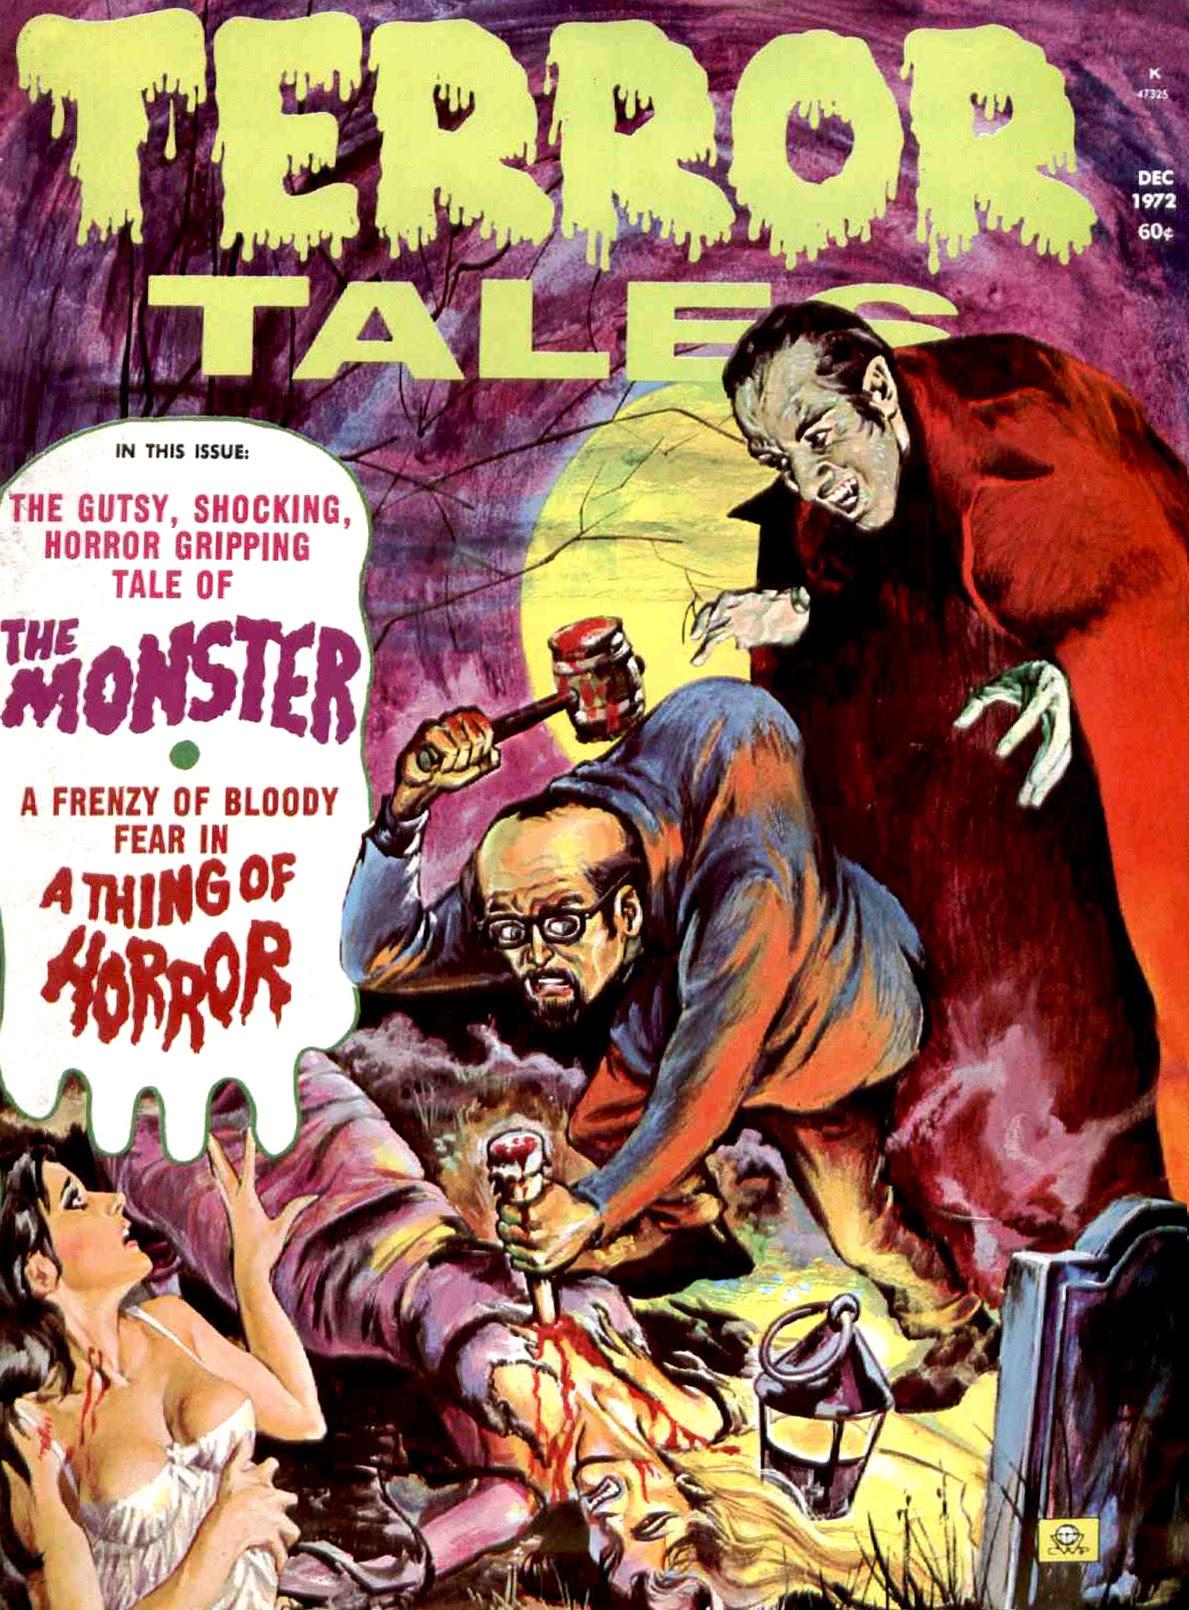 Terror Tales Vol. 04 #7 (Eerie Publications, 1972)